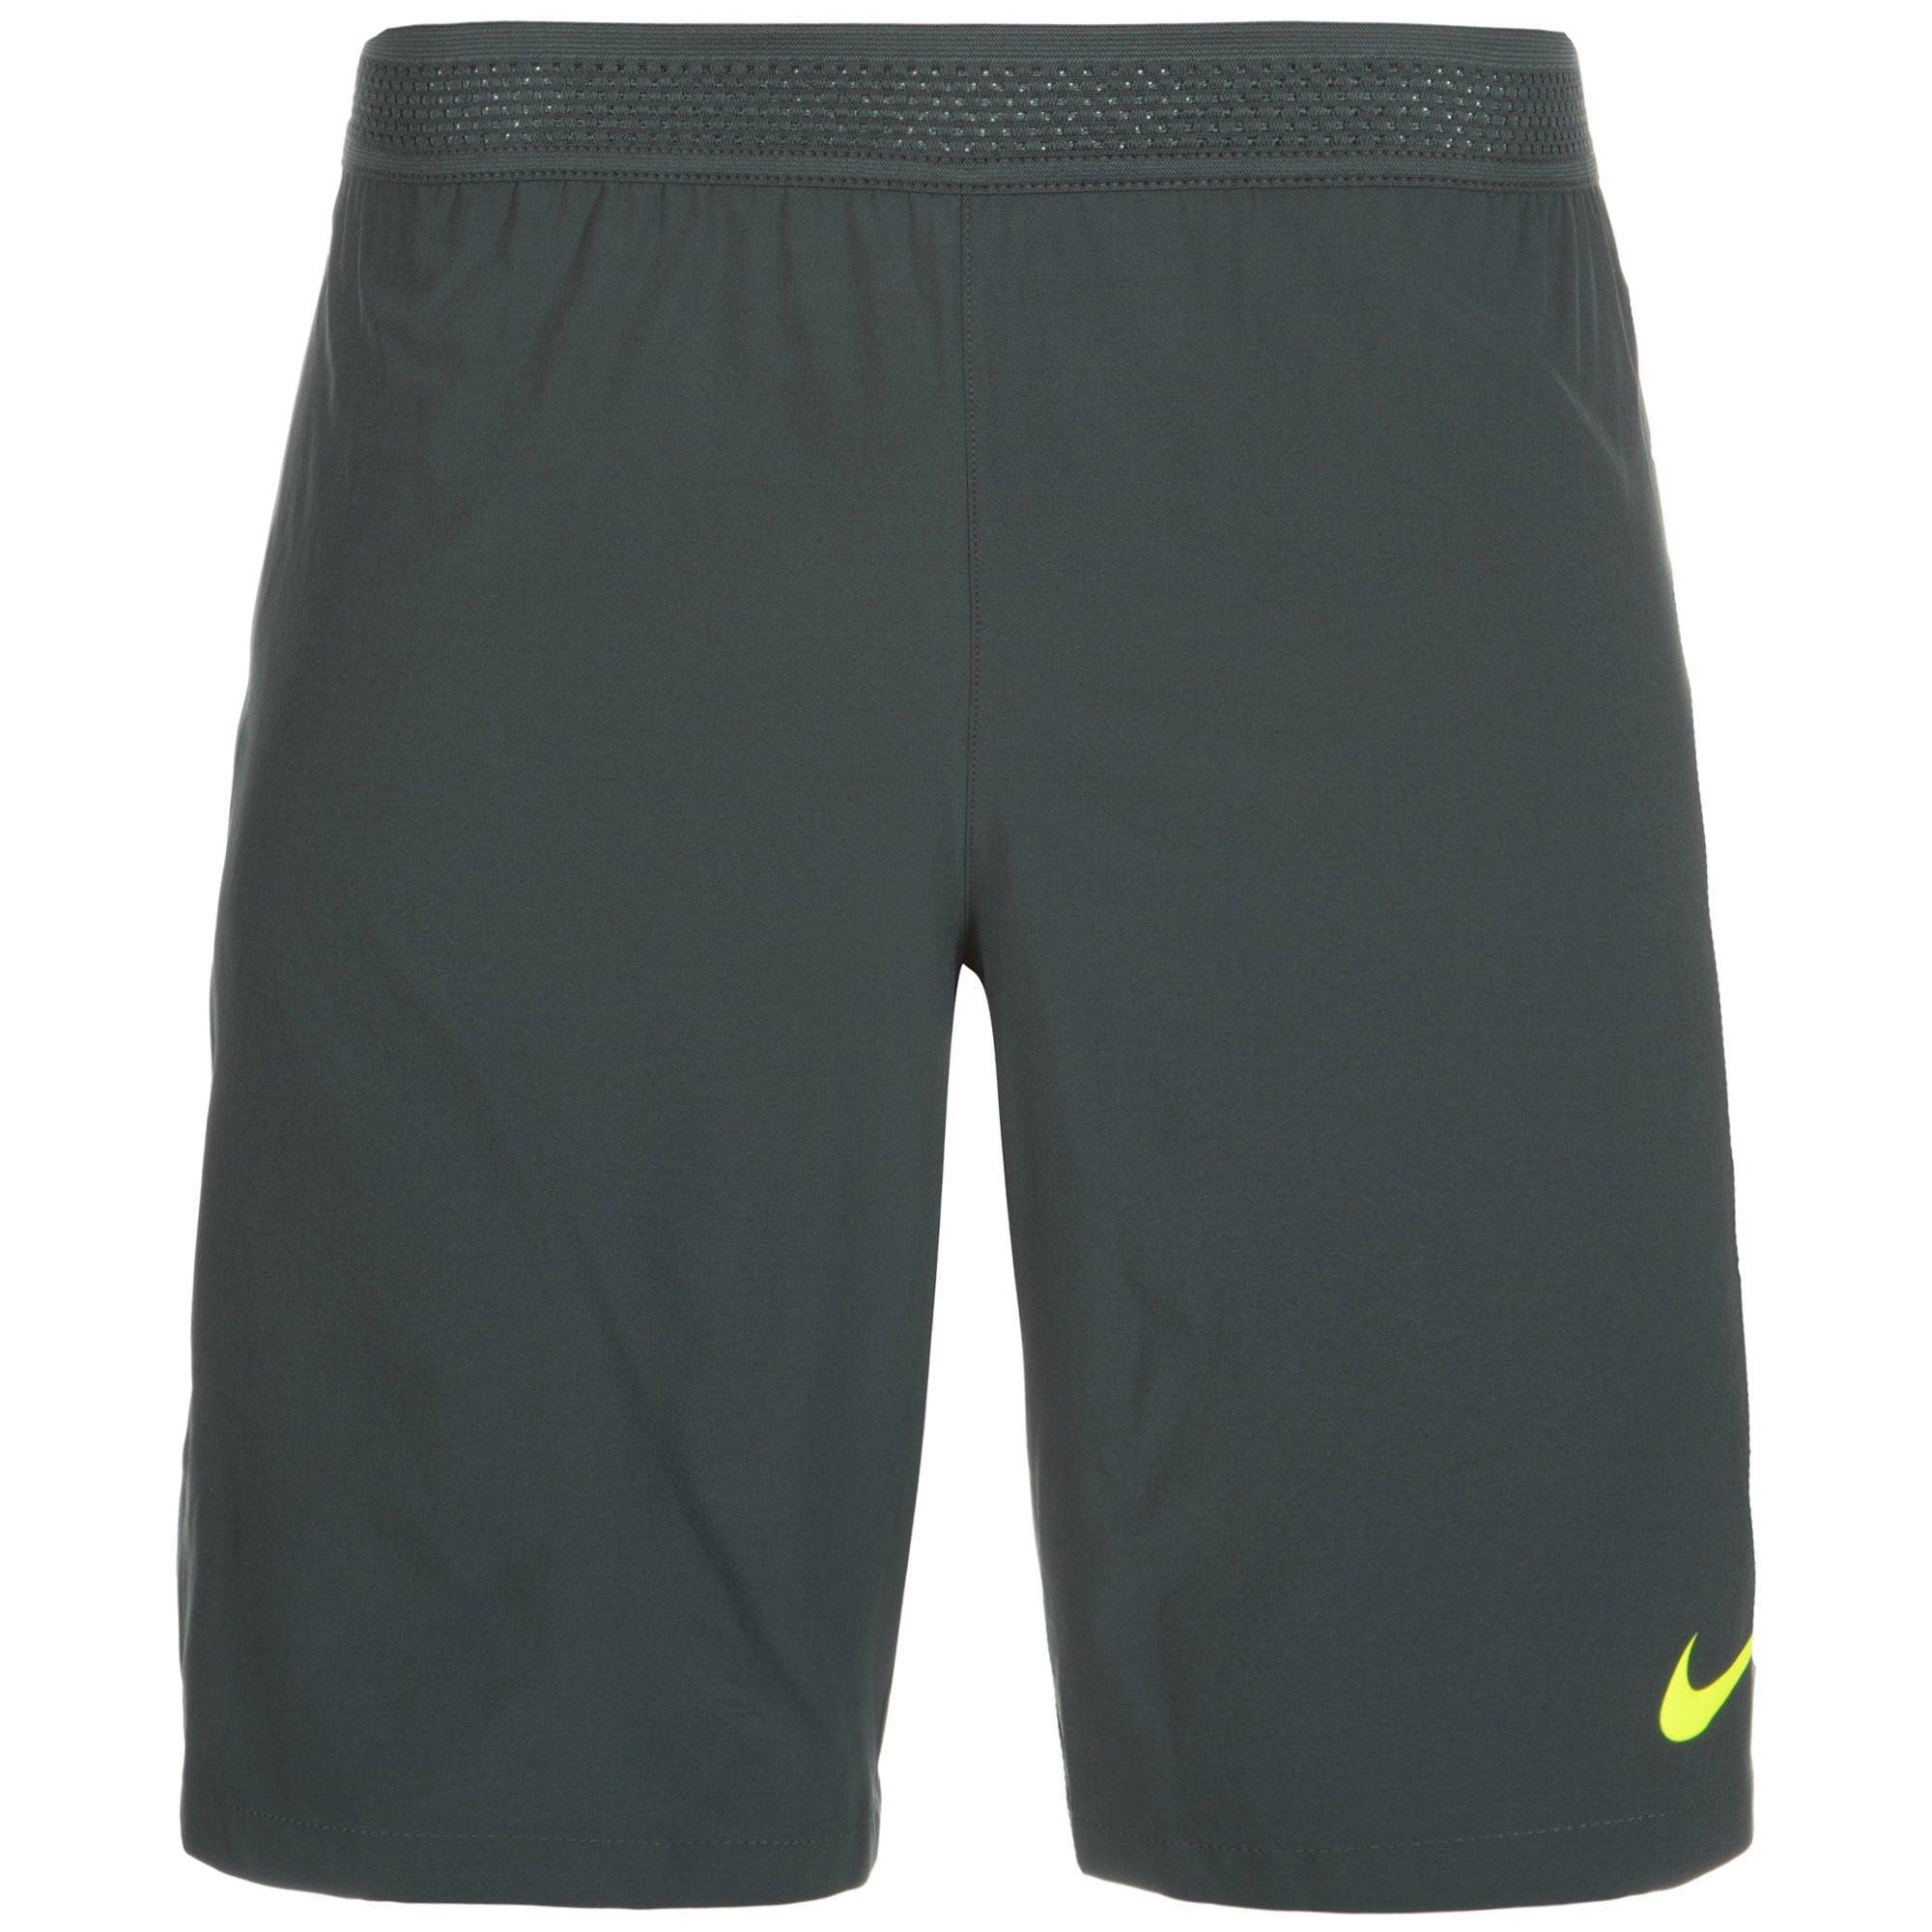 Nike Flex Strike Short Herren | Sportbekleidung > Sporthosen > Sonstige Sporthosen | Grün | Polyester - Elasthan | NIKE